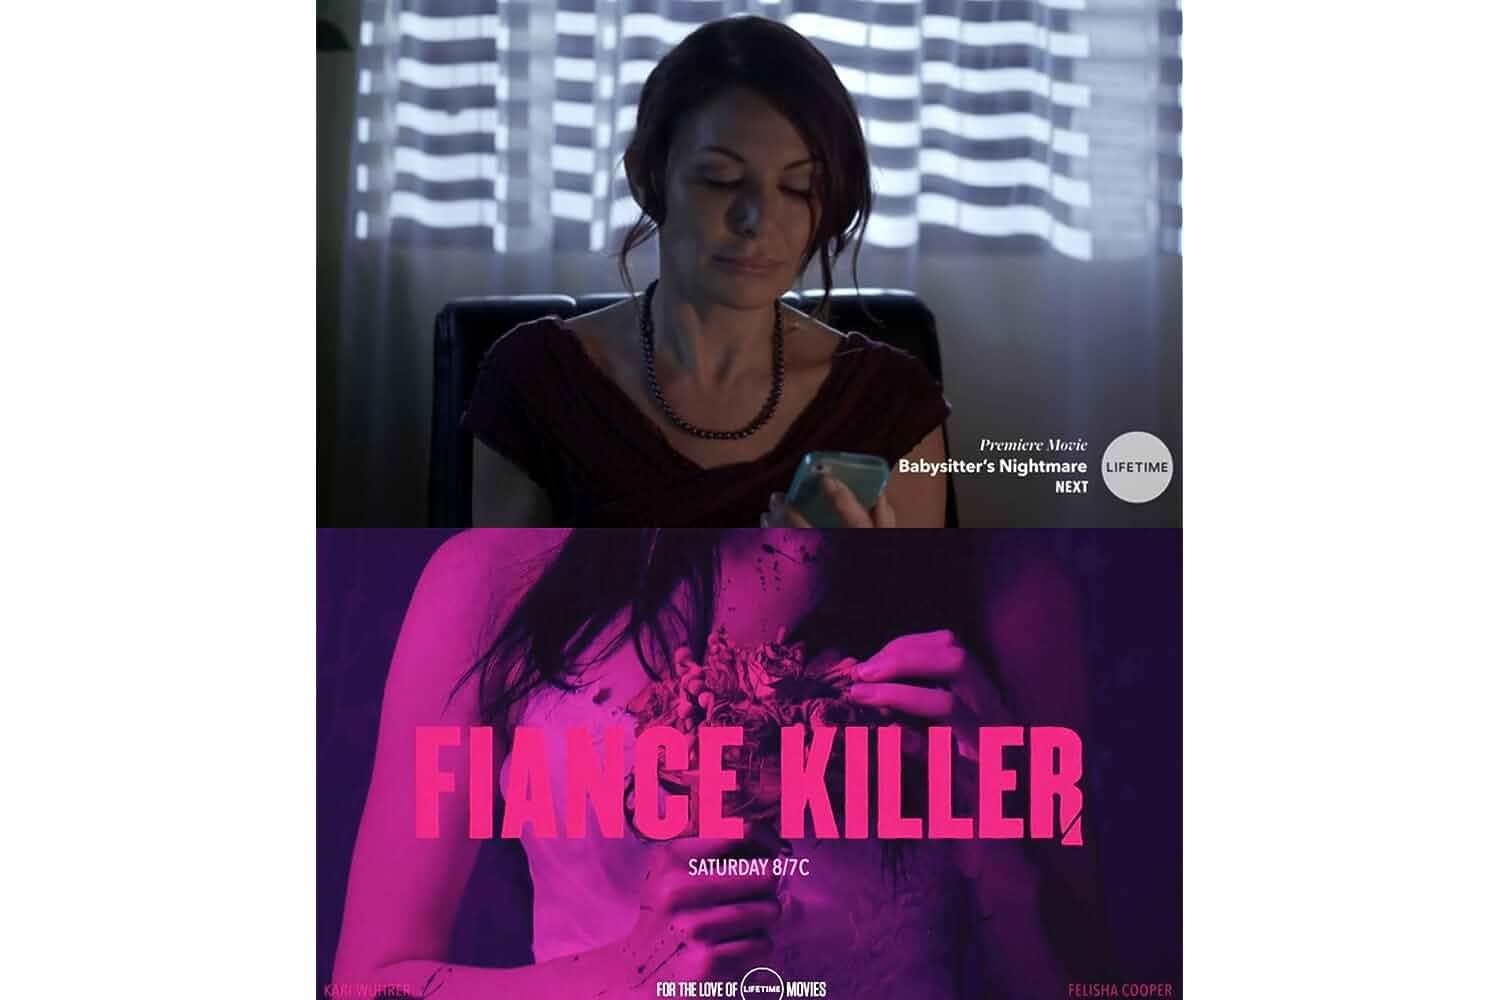 Fianc Killer (2018)